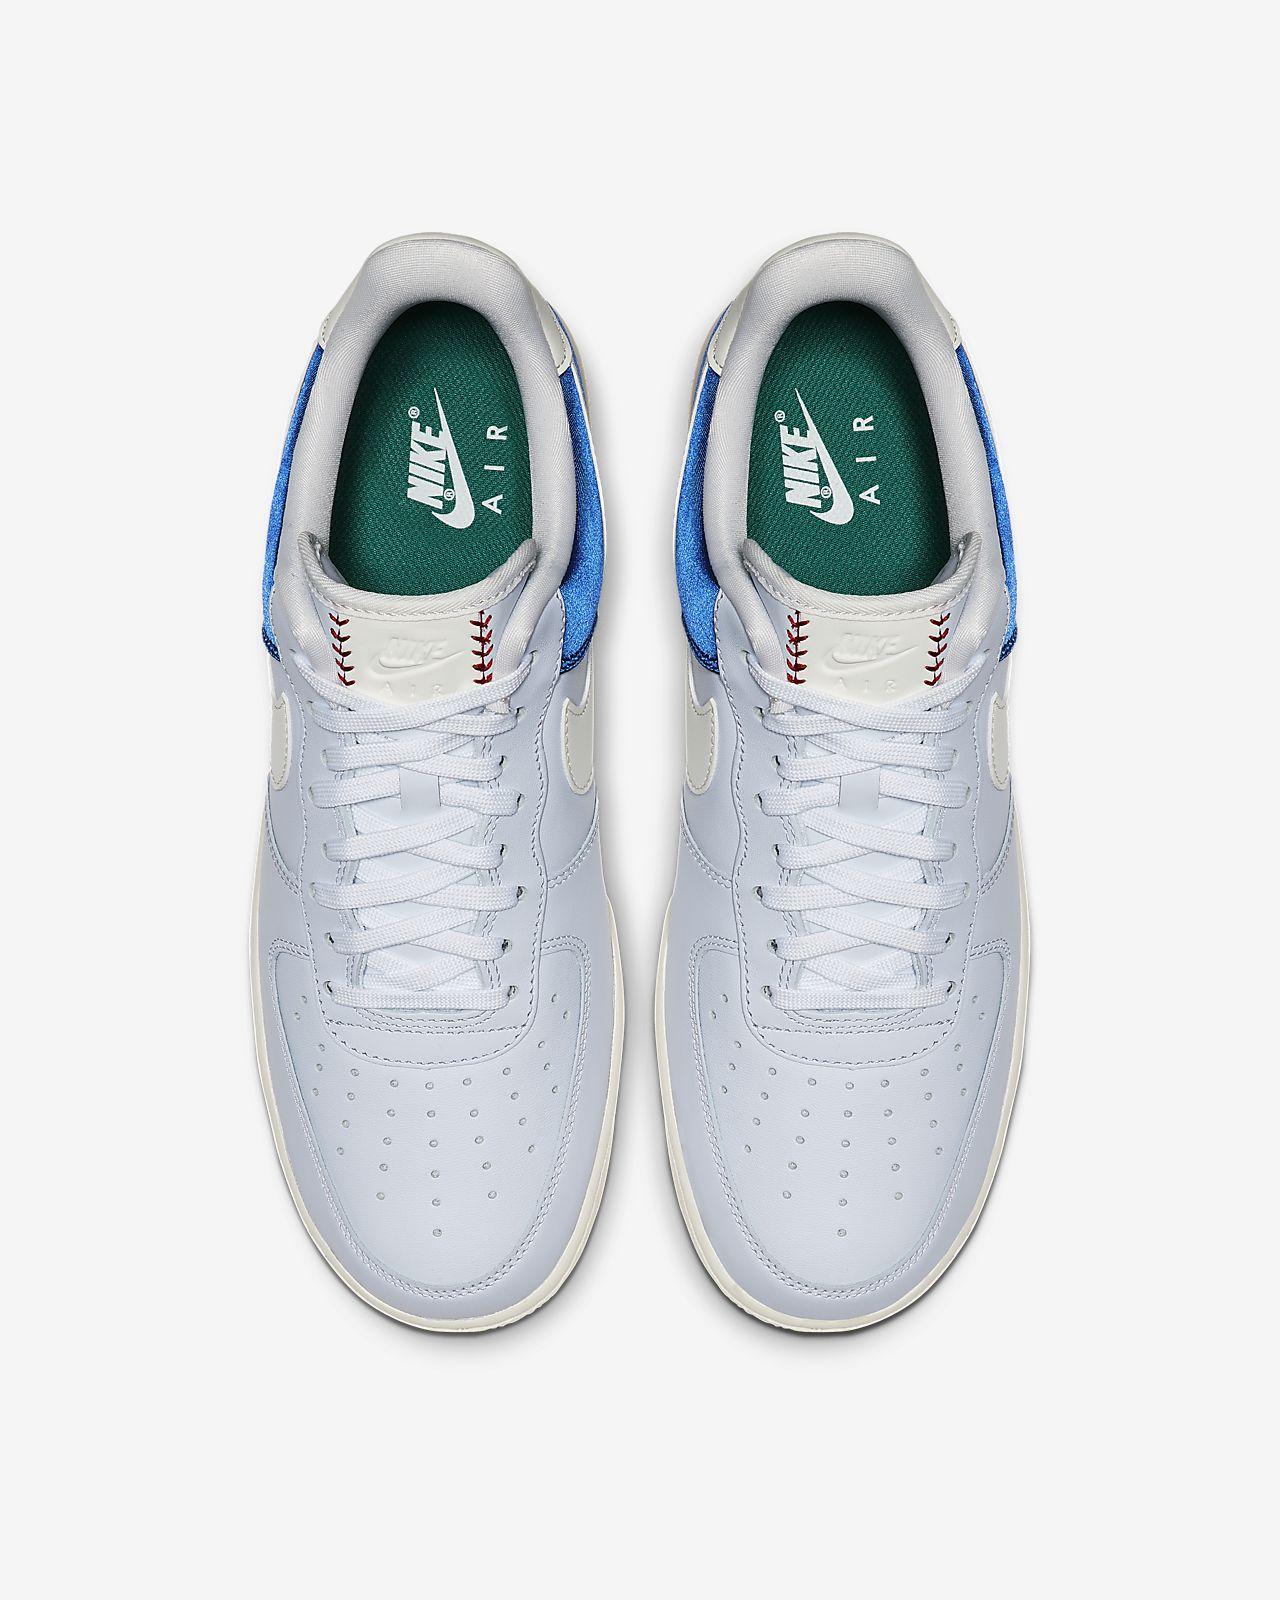 new product 9ac62 ce6de Nike Air Force 1 '07 Men's Shoe. Nike.com